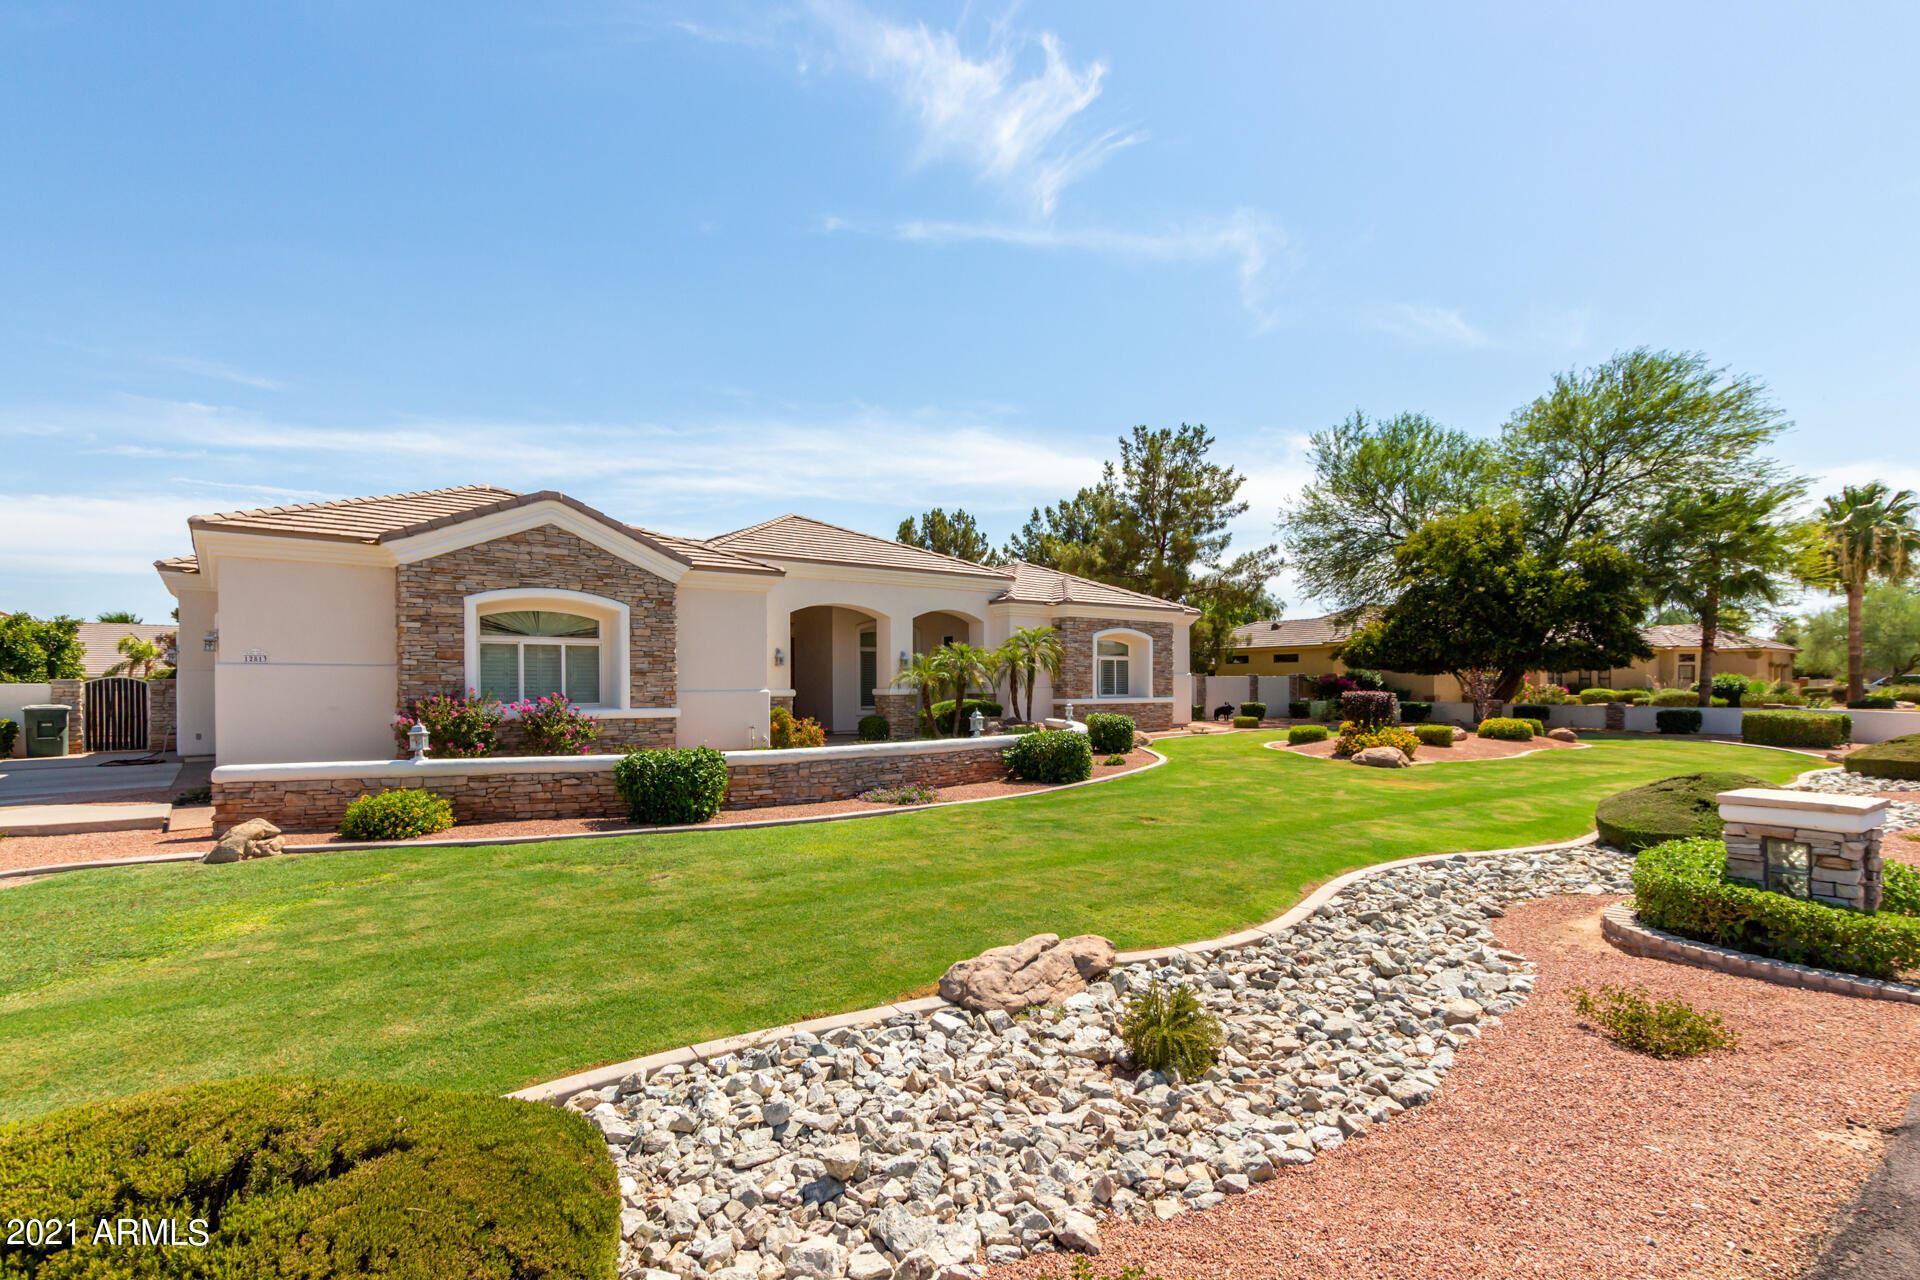 Photo of 12813 W DENTON Avenue, Litchfield Park, AZ 85340 (MLS # 6269853)